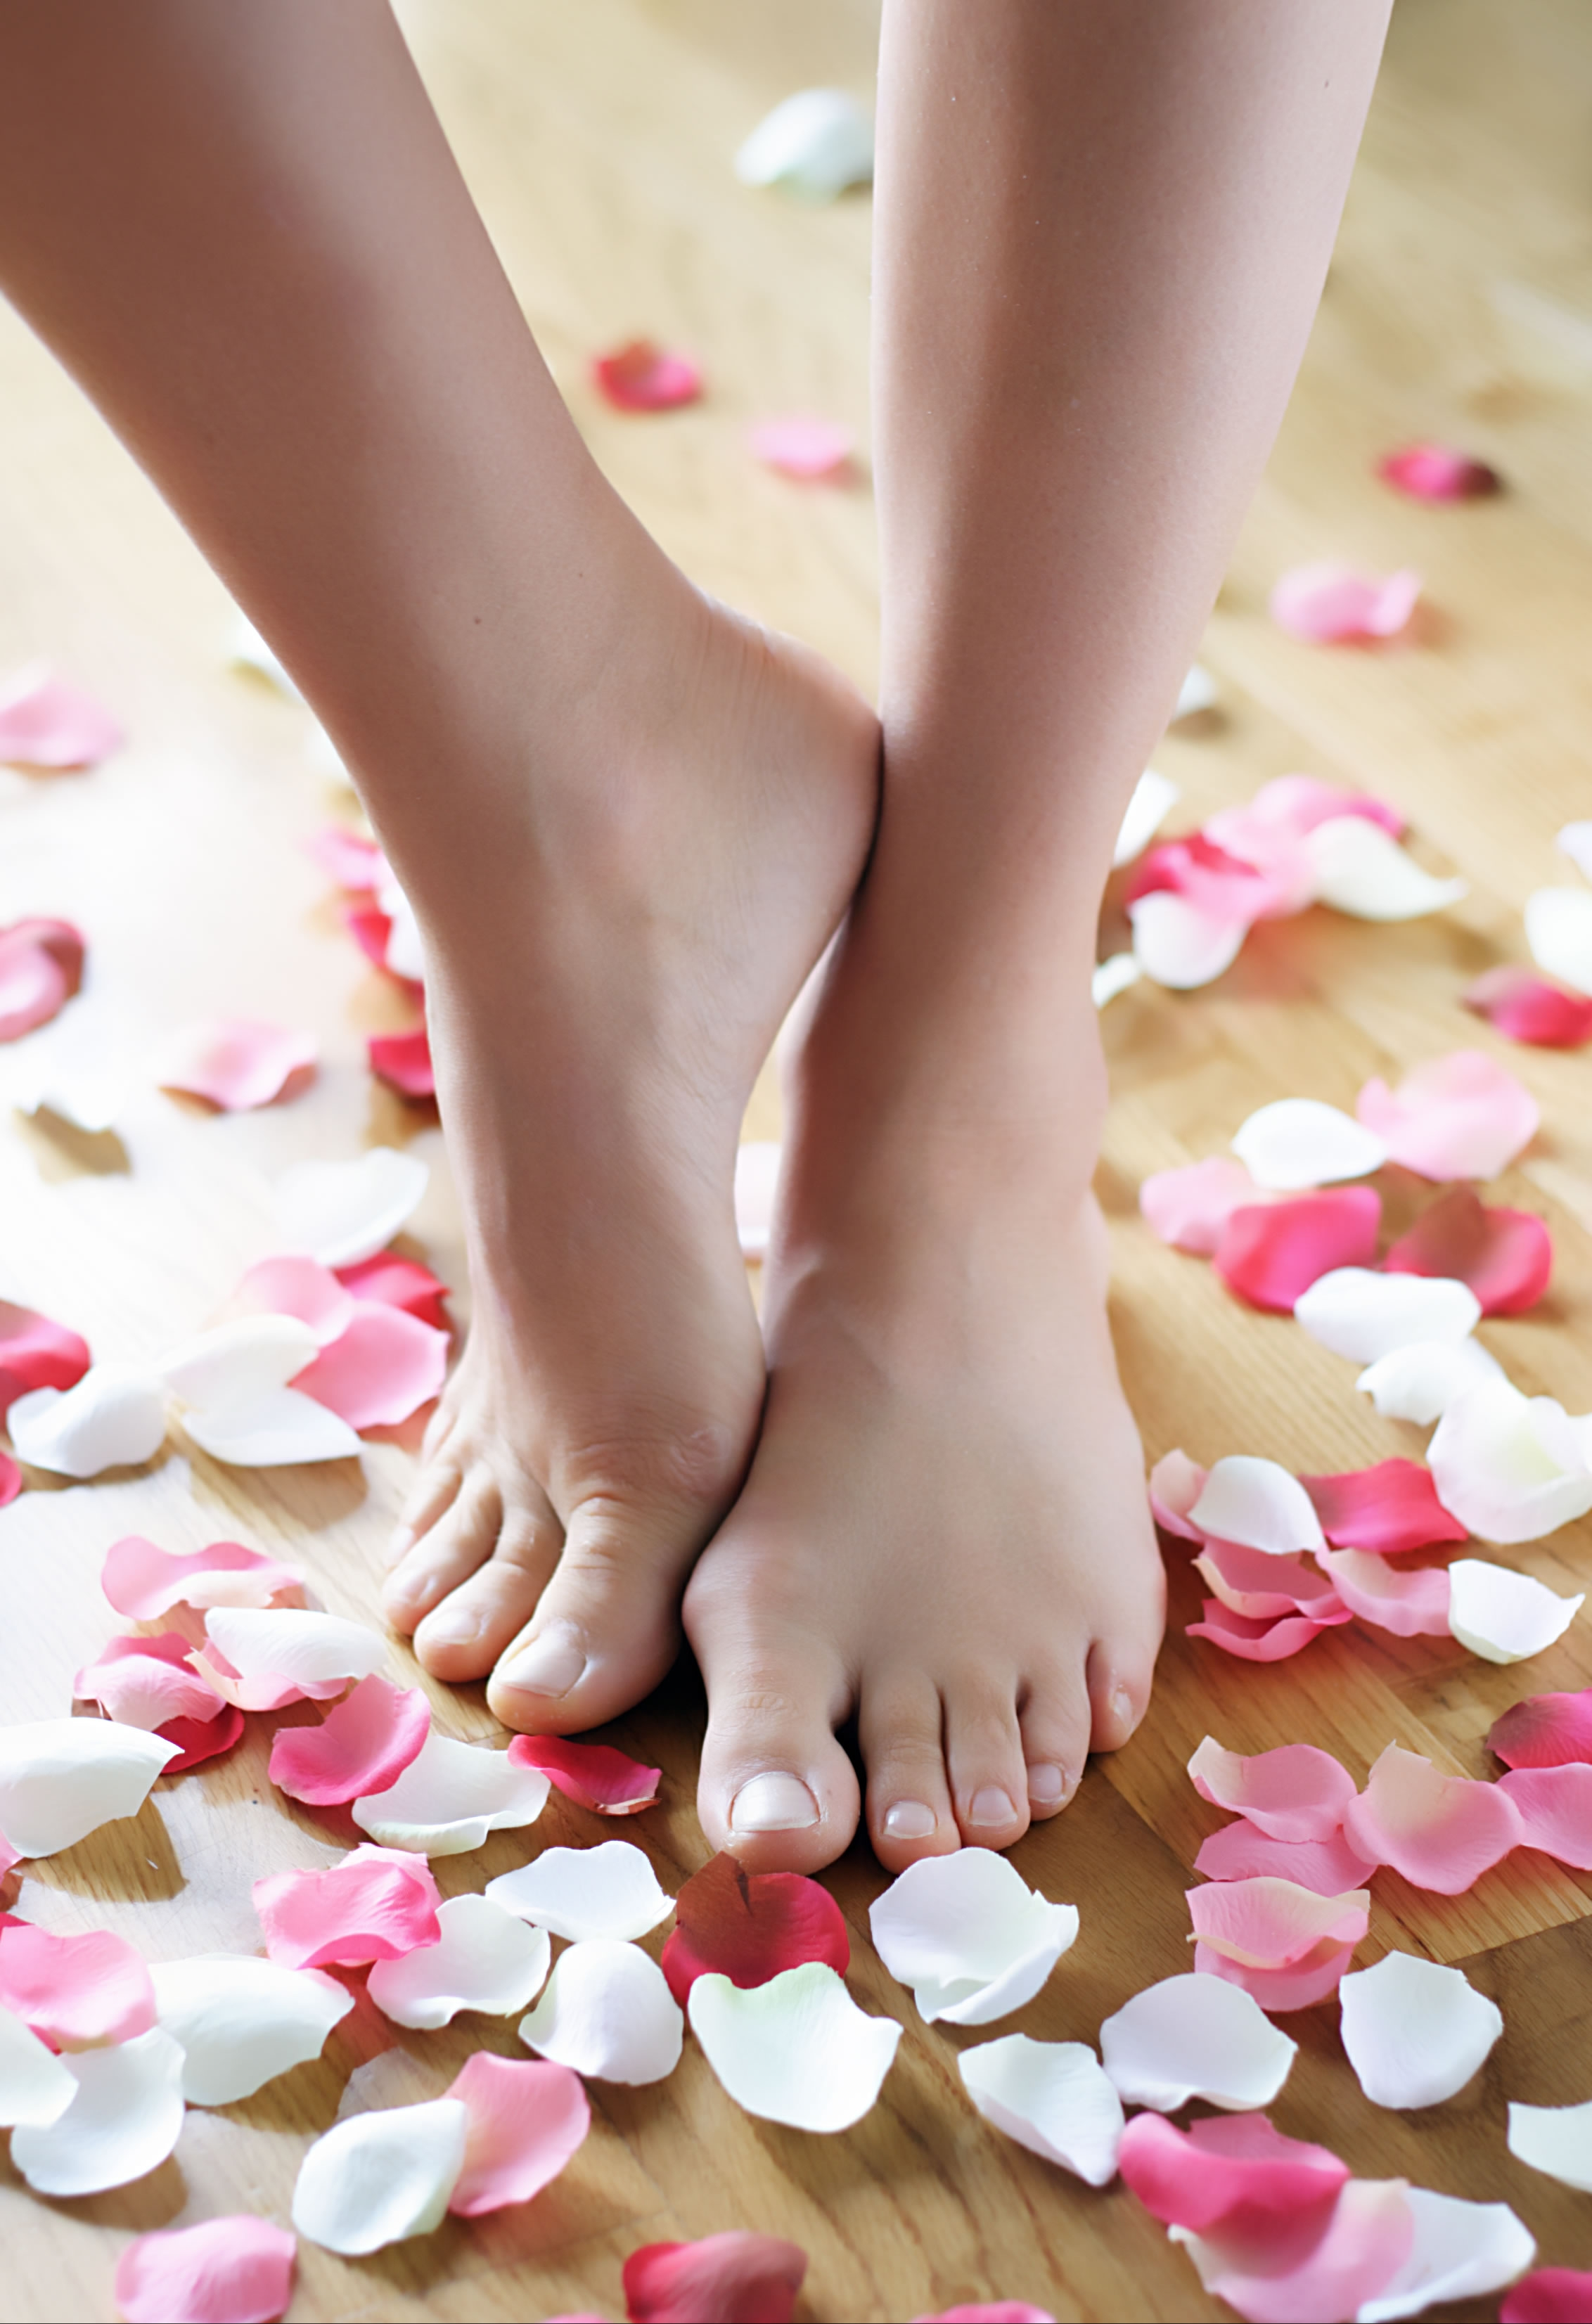 Фото красиві ноги 9 фотография